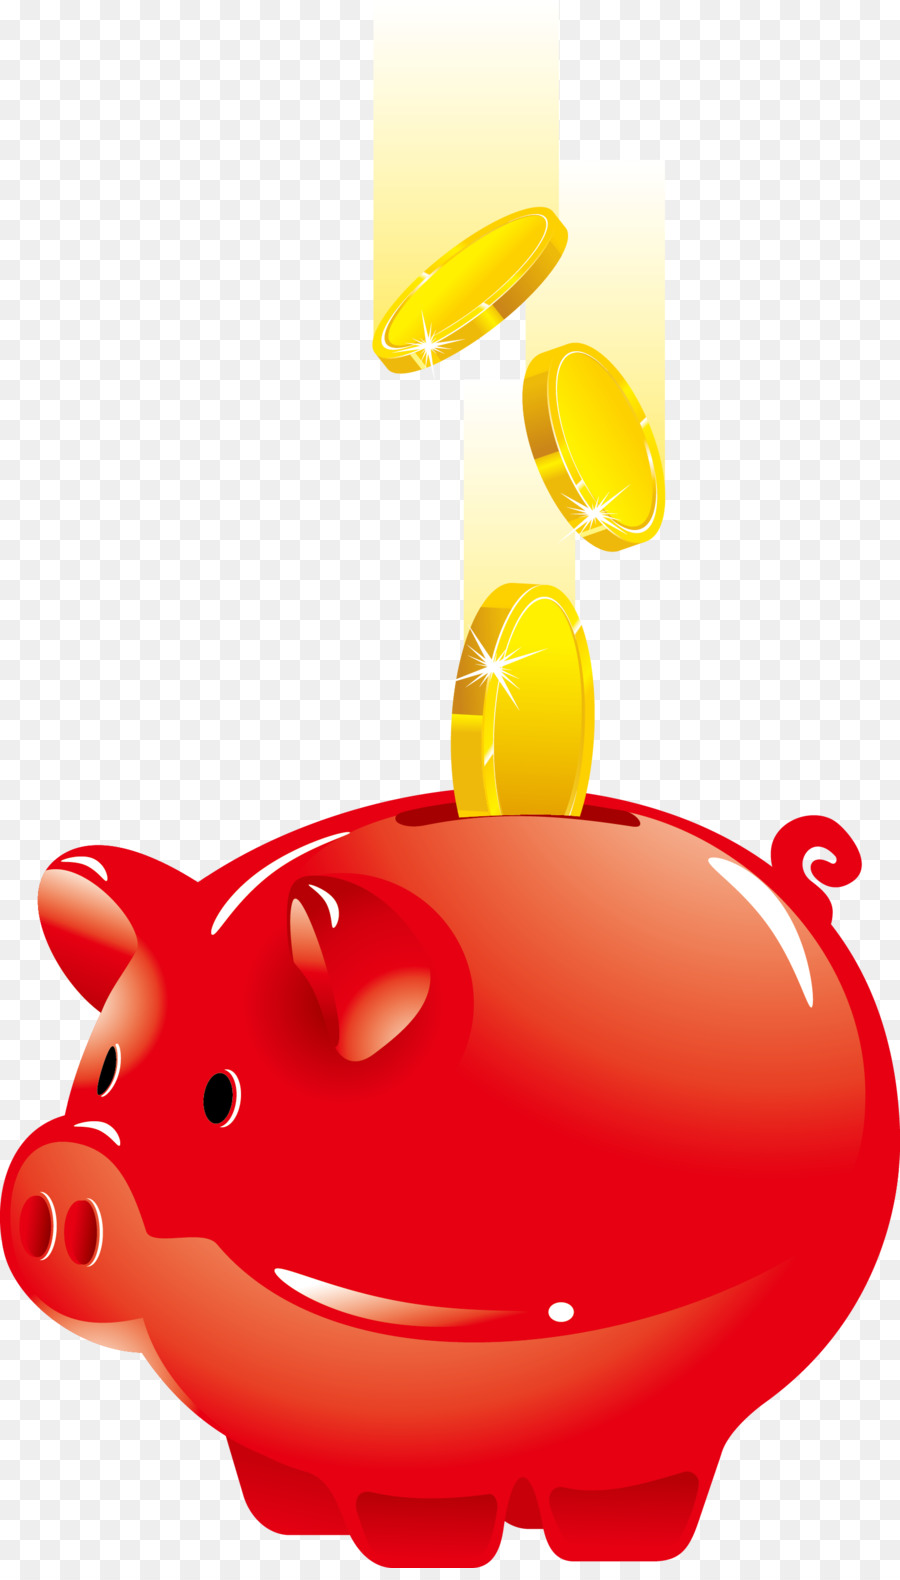 Piggy Bank Saving Money Vector Red Piggy Bank Png Download  Free Transparent Pig